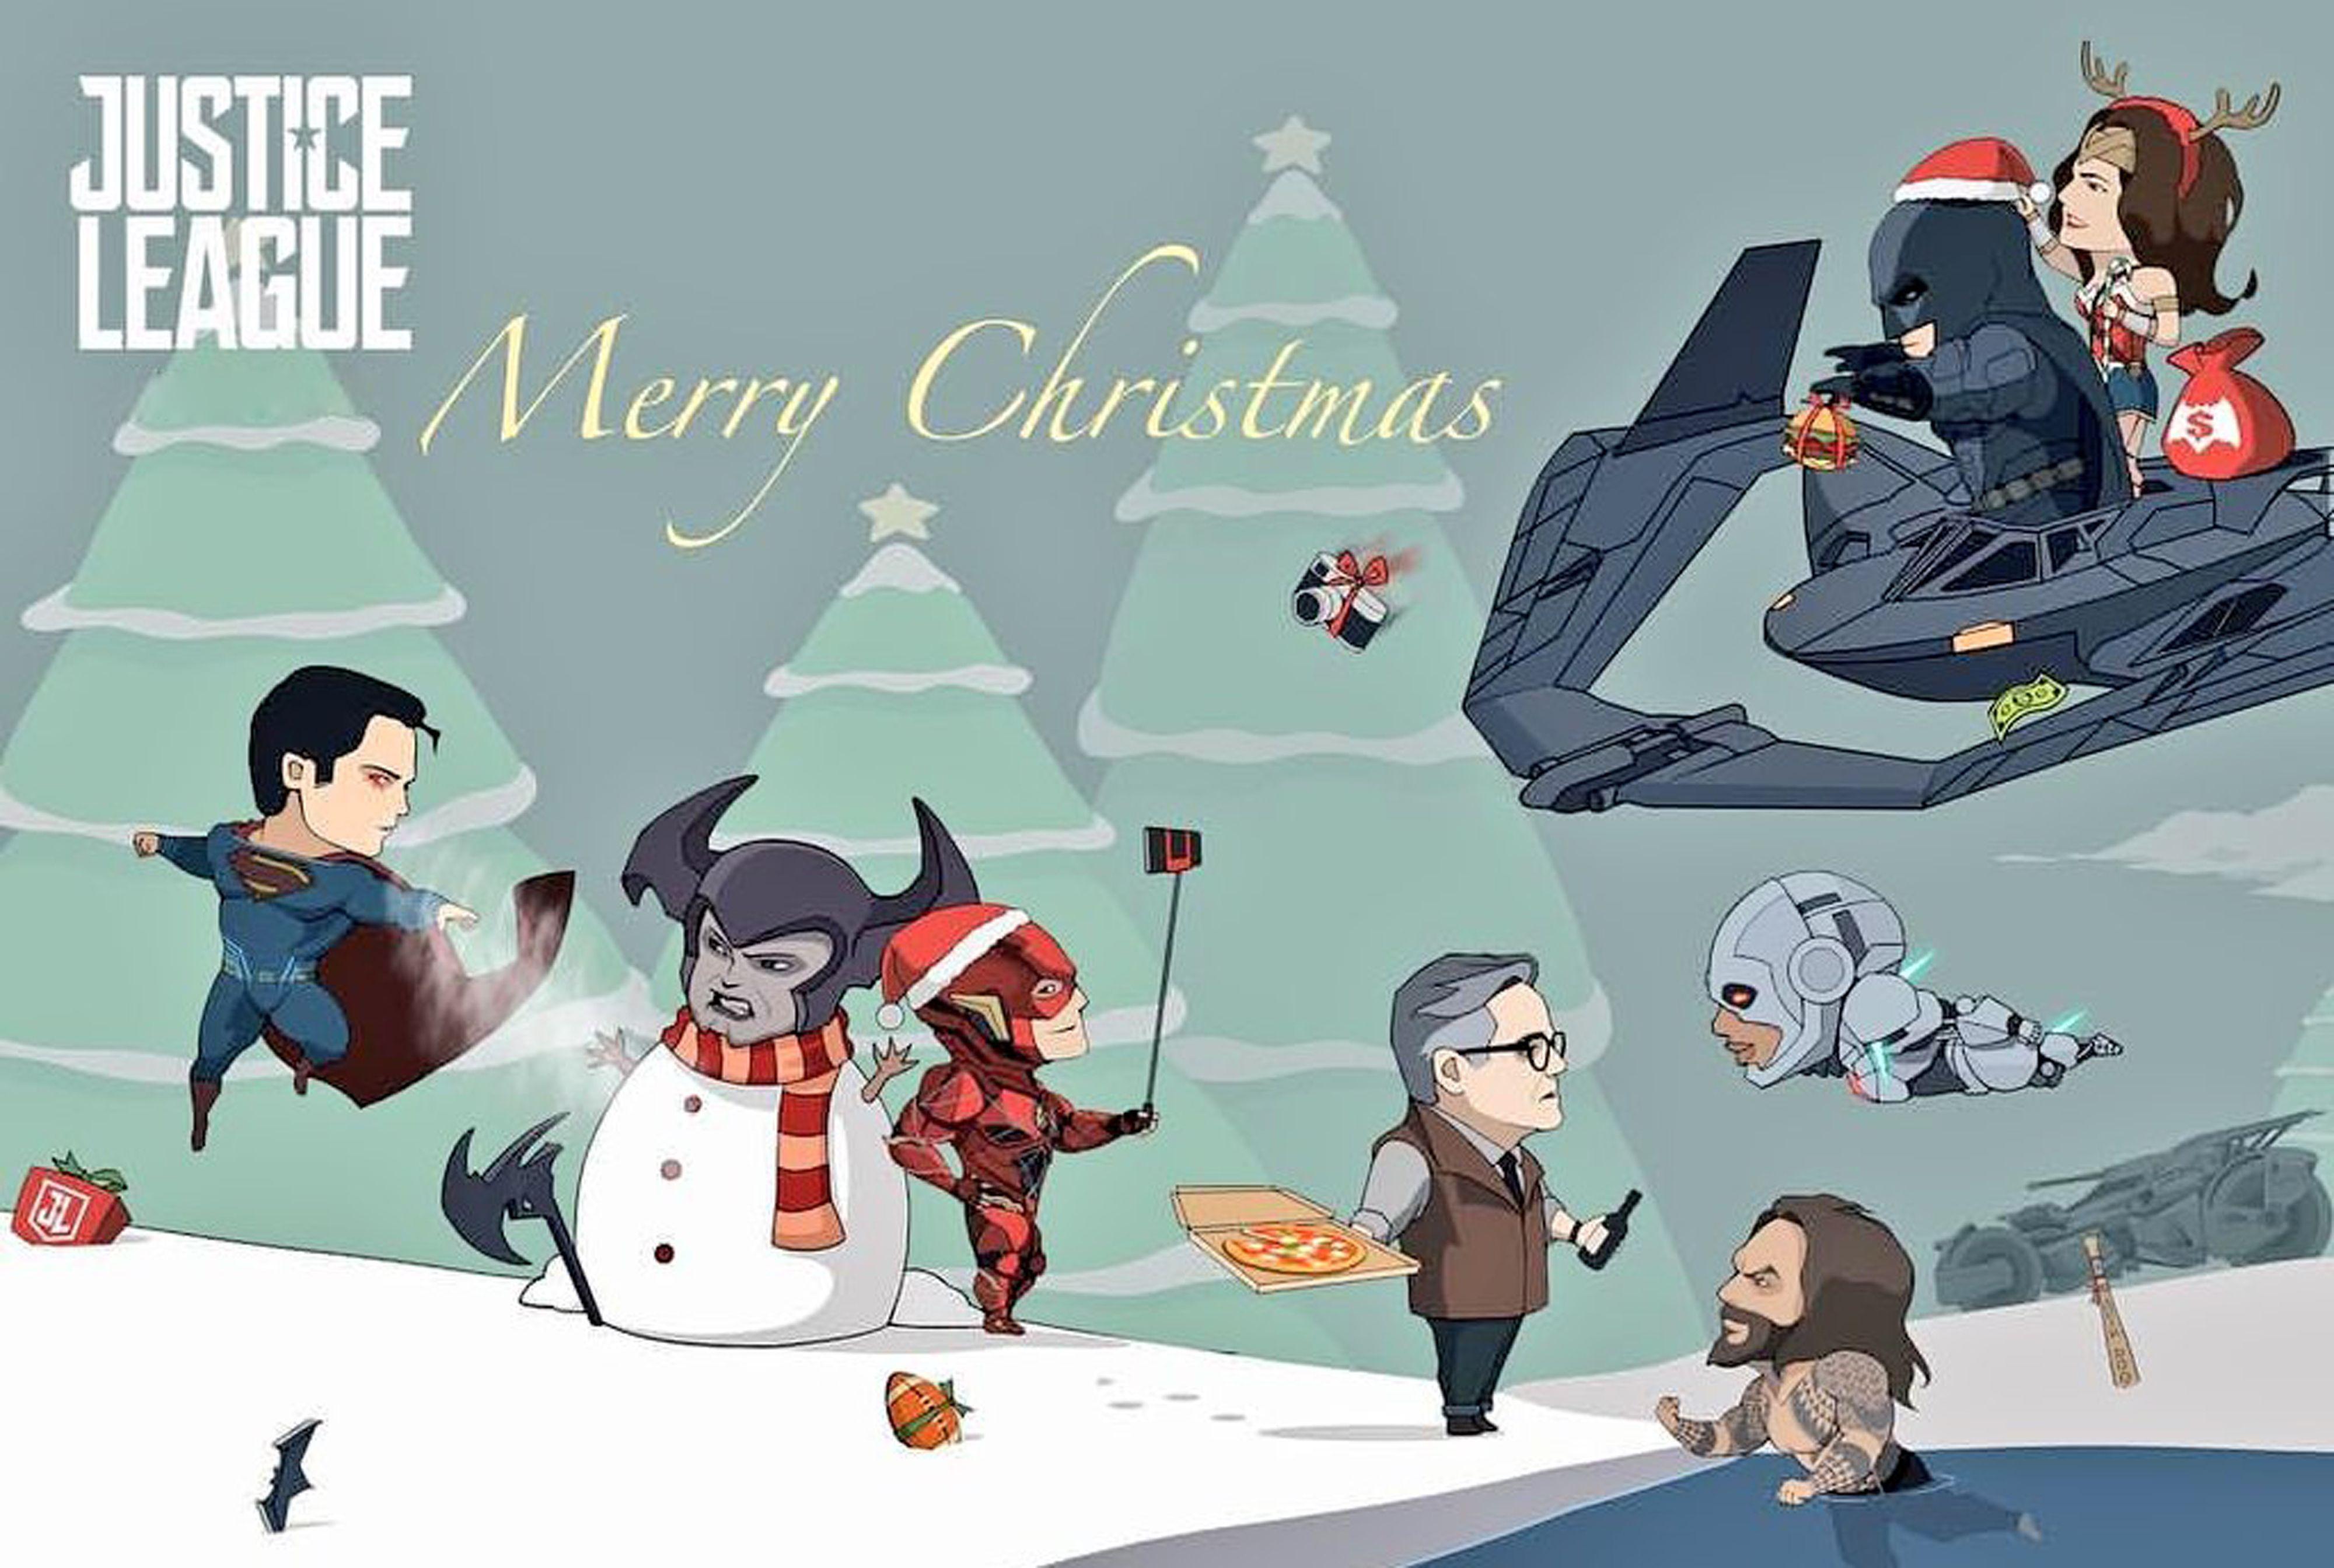 Justice Leaguers celebrating Christmas😂 #JusticeLeague #Christmas ...